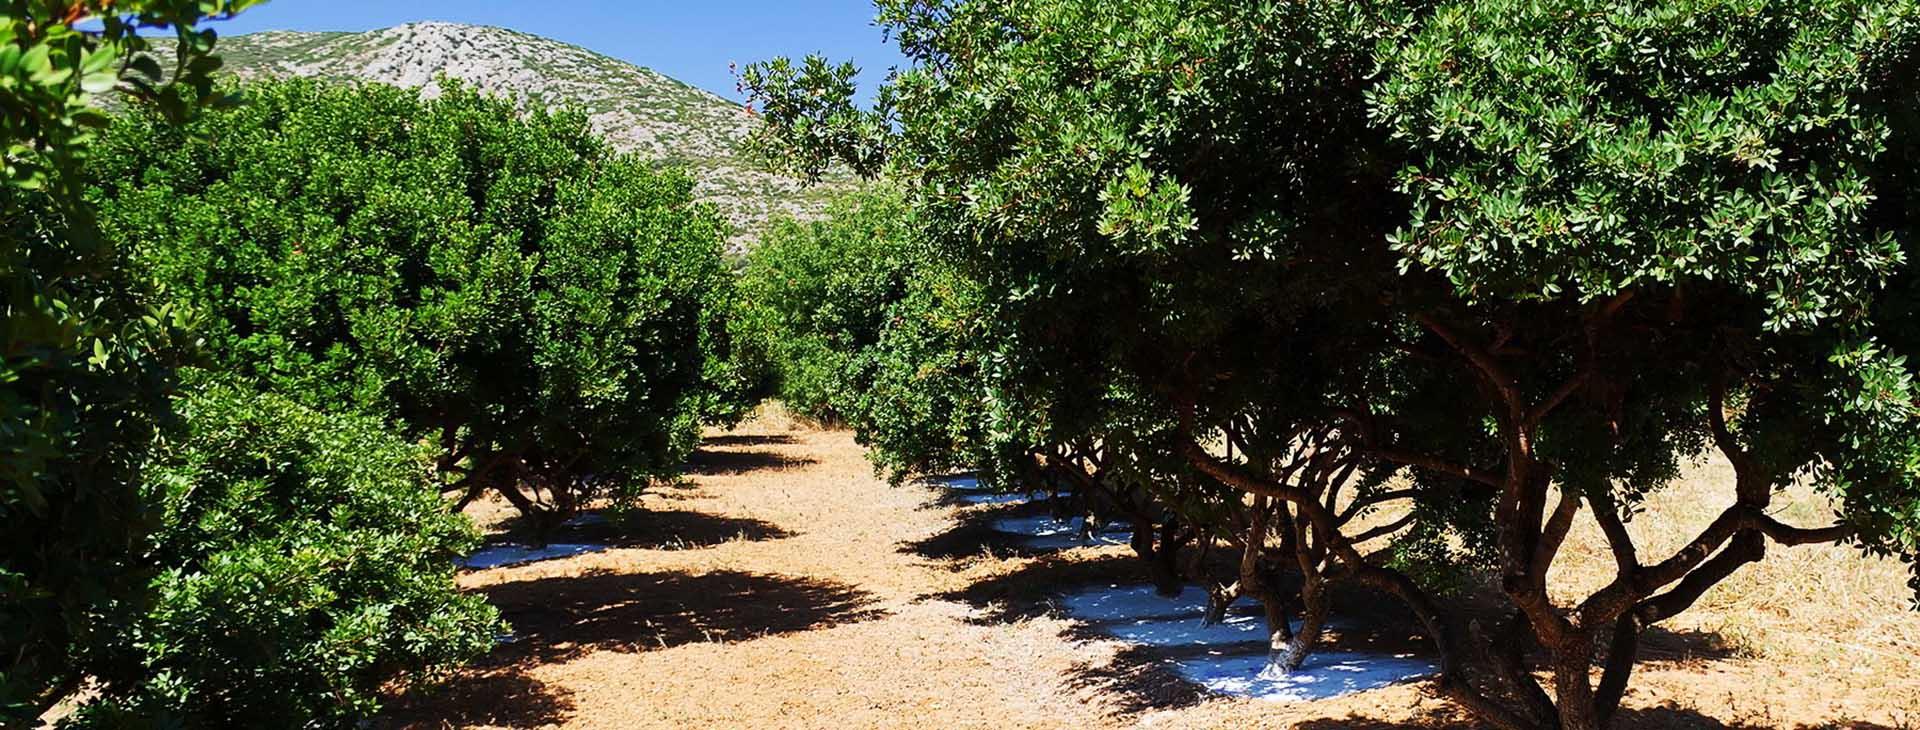 Mastic trees, Chios island